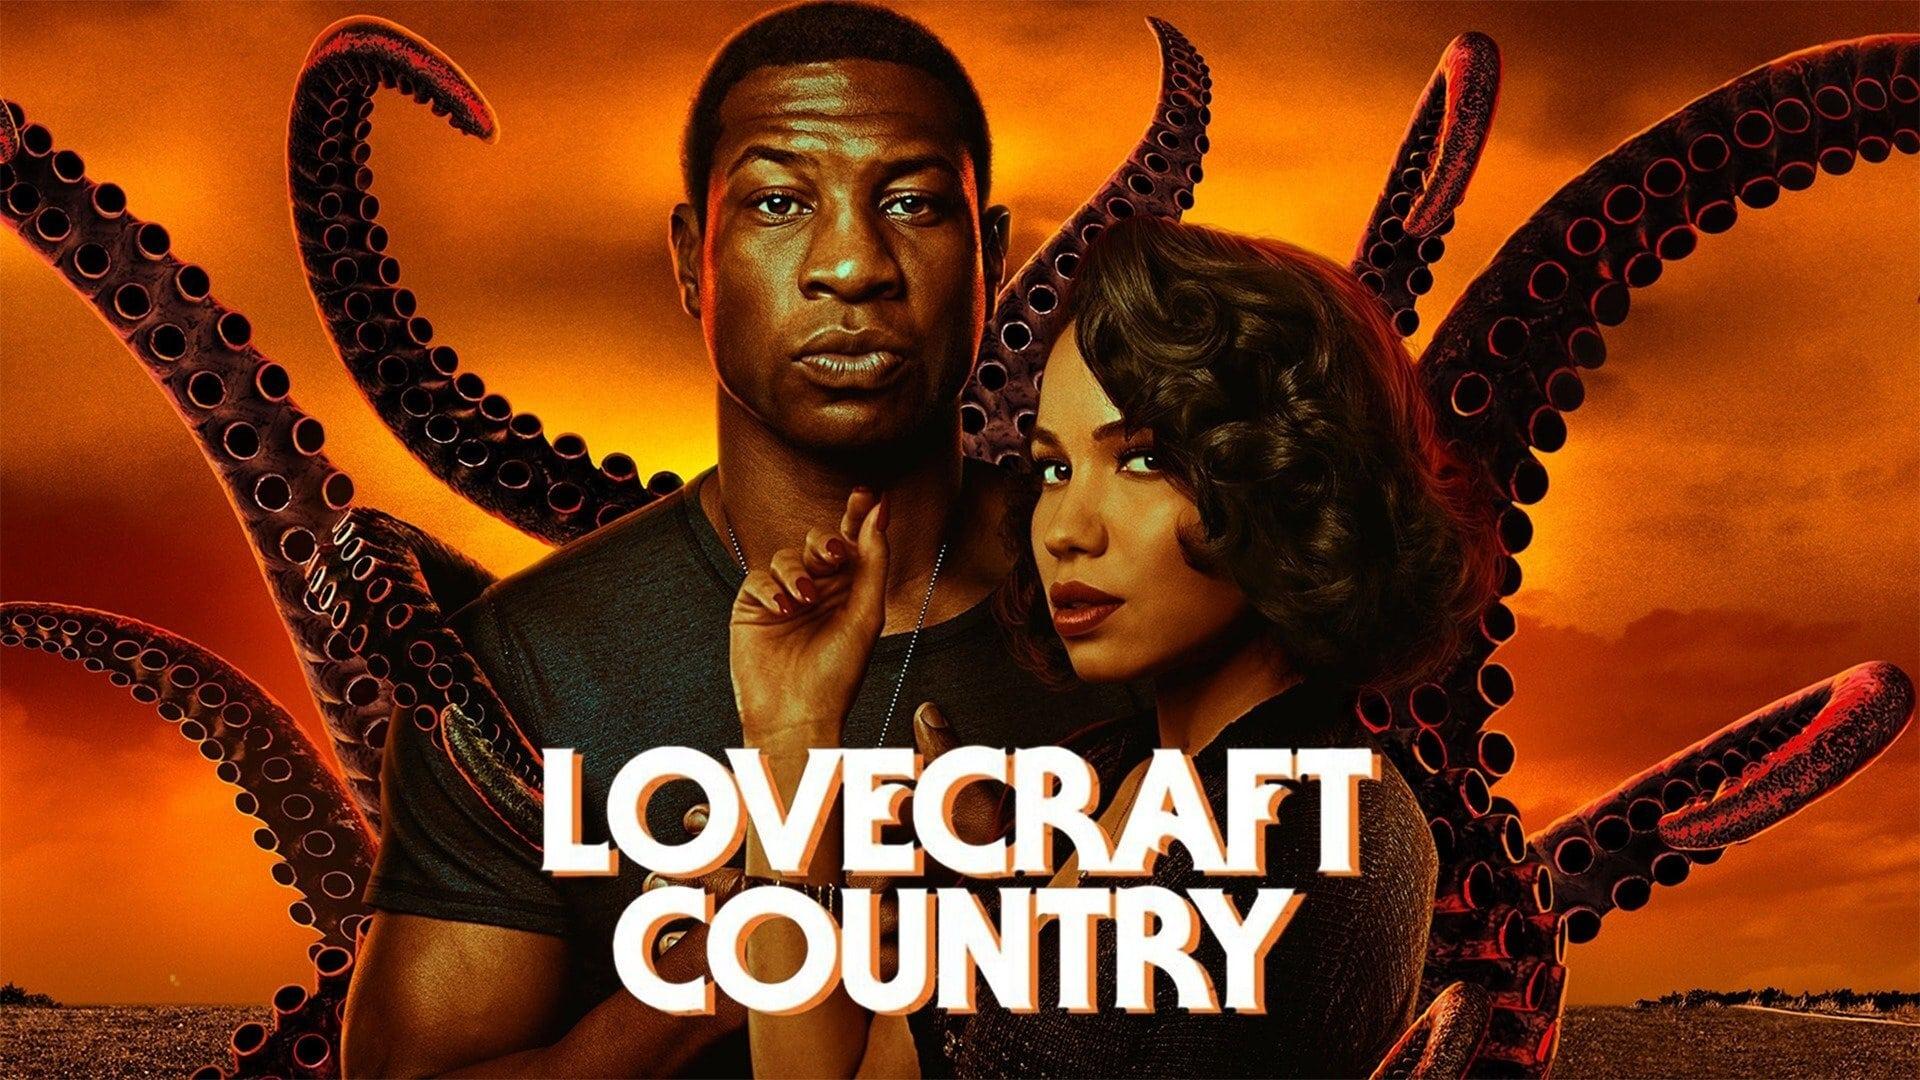 Lovecraft Country Season 1 episode 8